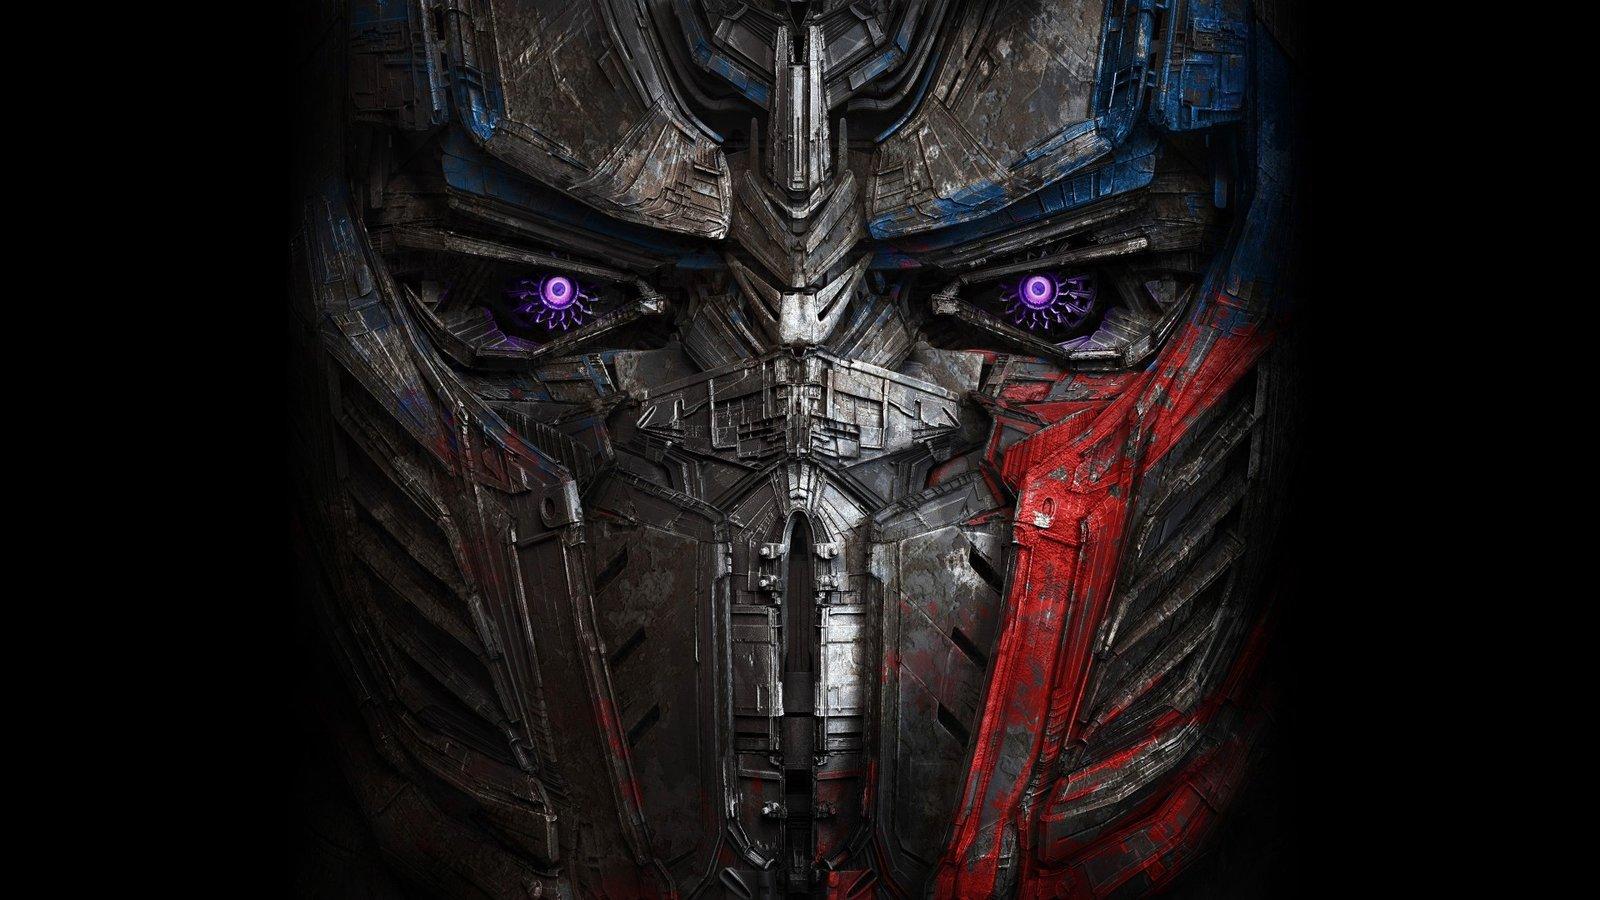 / Transformers: The Last Knight